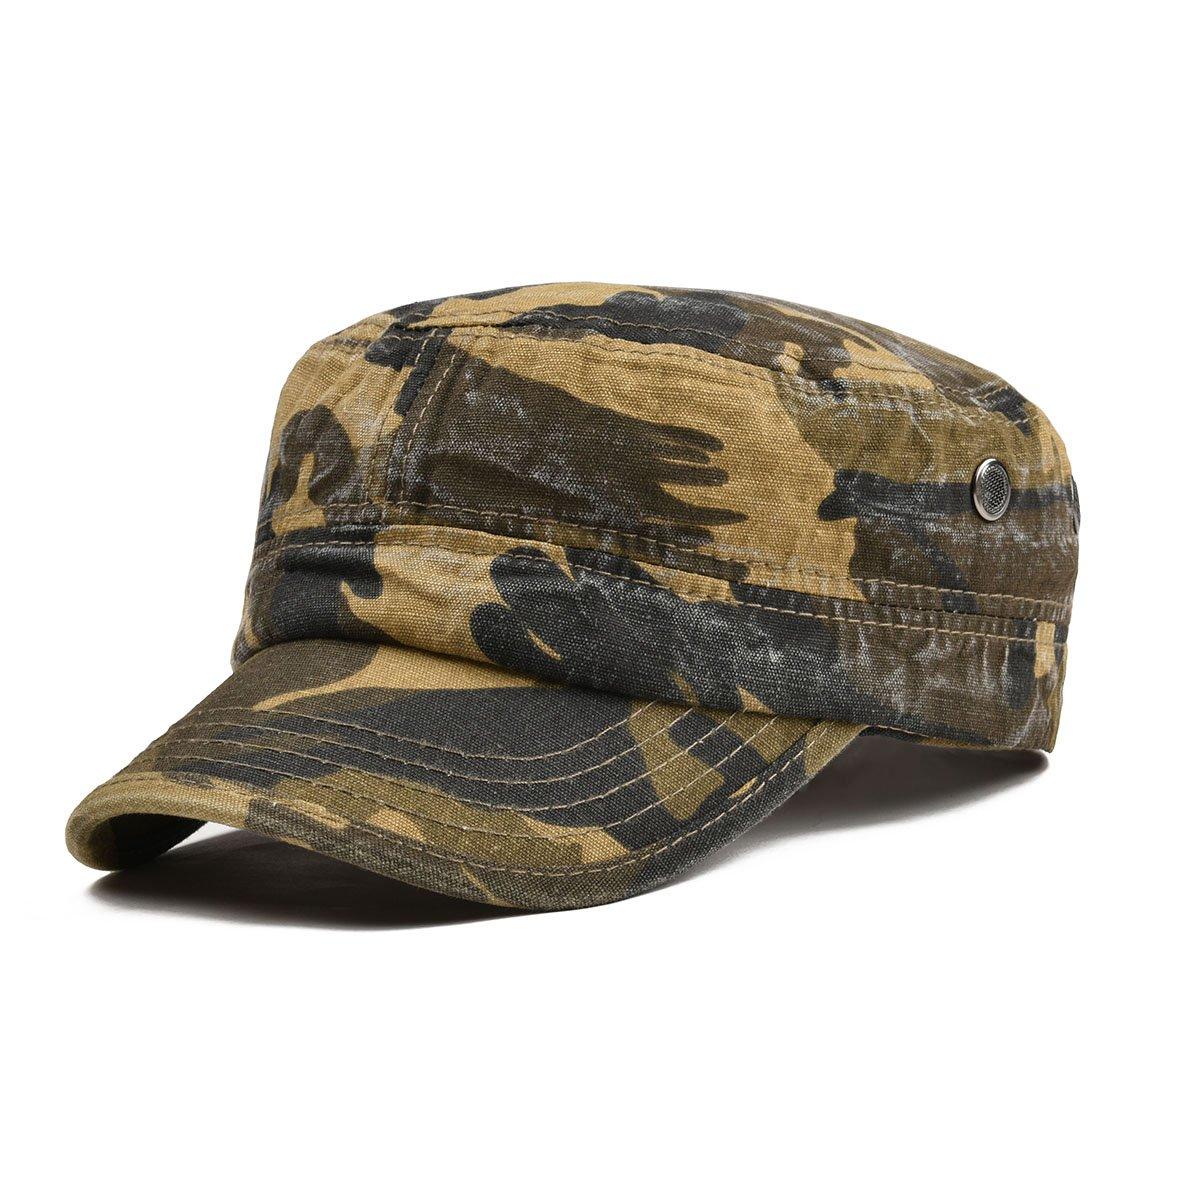 VOBOOM Washed Cotton Military Caps Cadet Army Caps Unique Design Vintage Flat Top Cap BDMZ162-A-gren